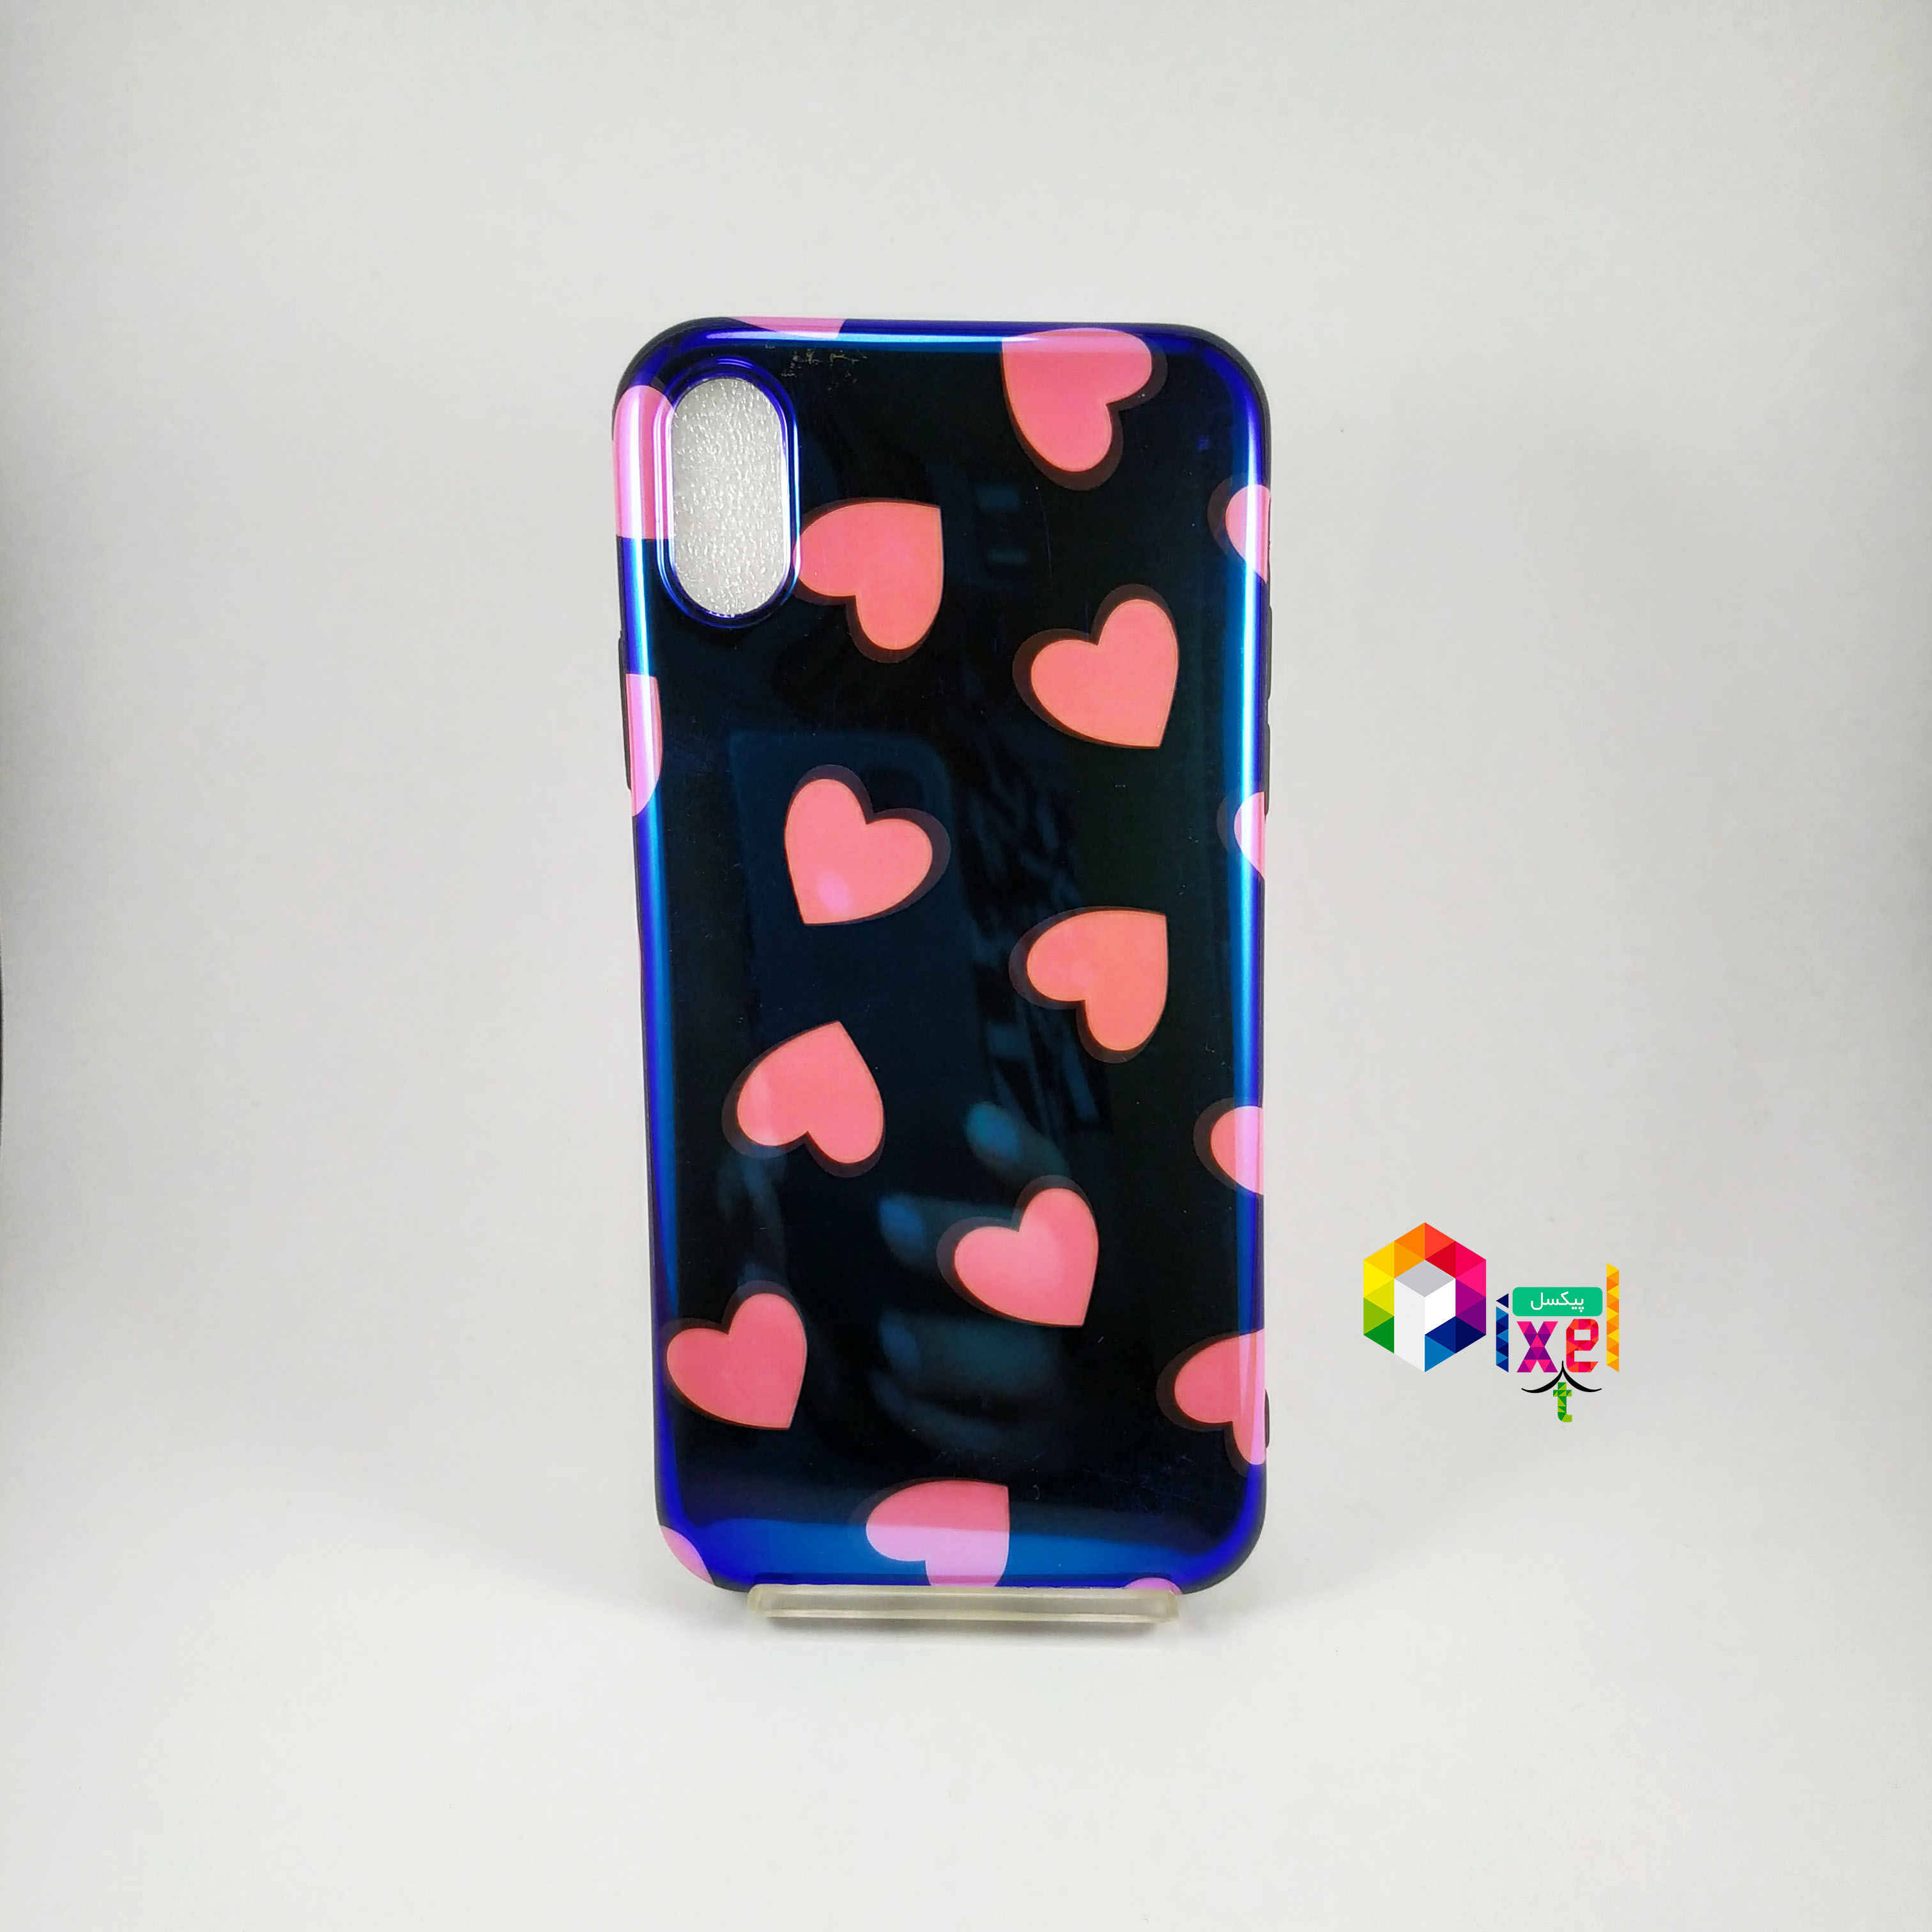 قاب قلبی یو وی iPhone X , iPhone XS